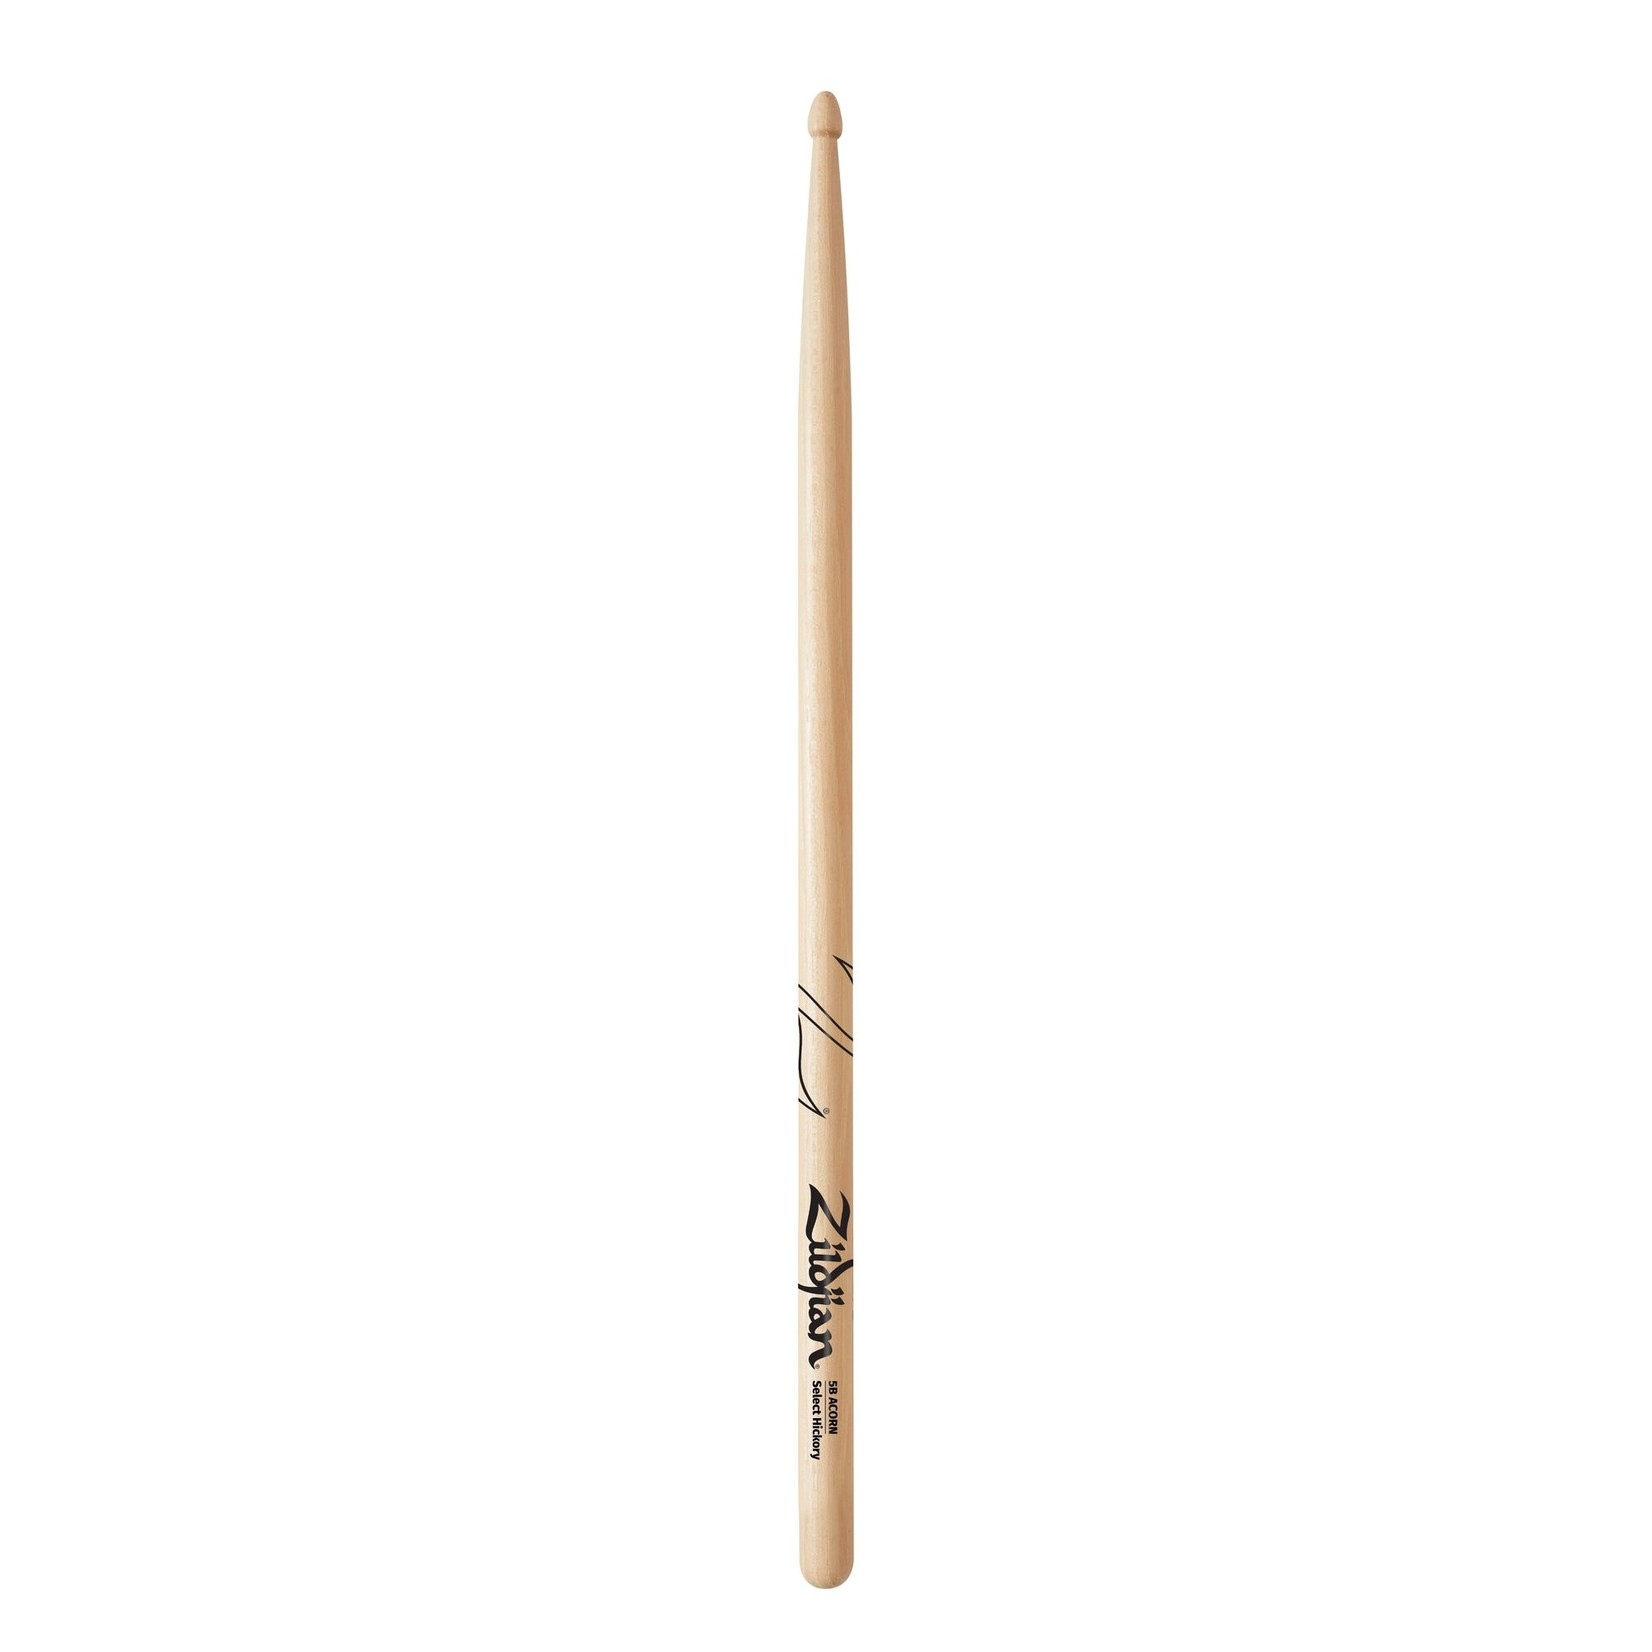 Zildjian Zildjian 5B Acorn Tip Drumsticks